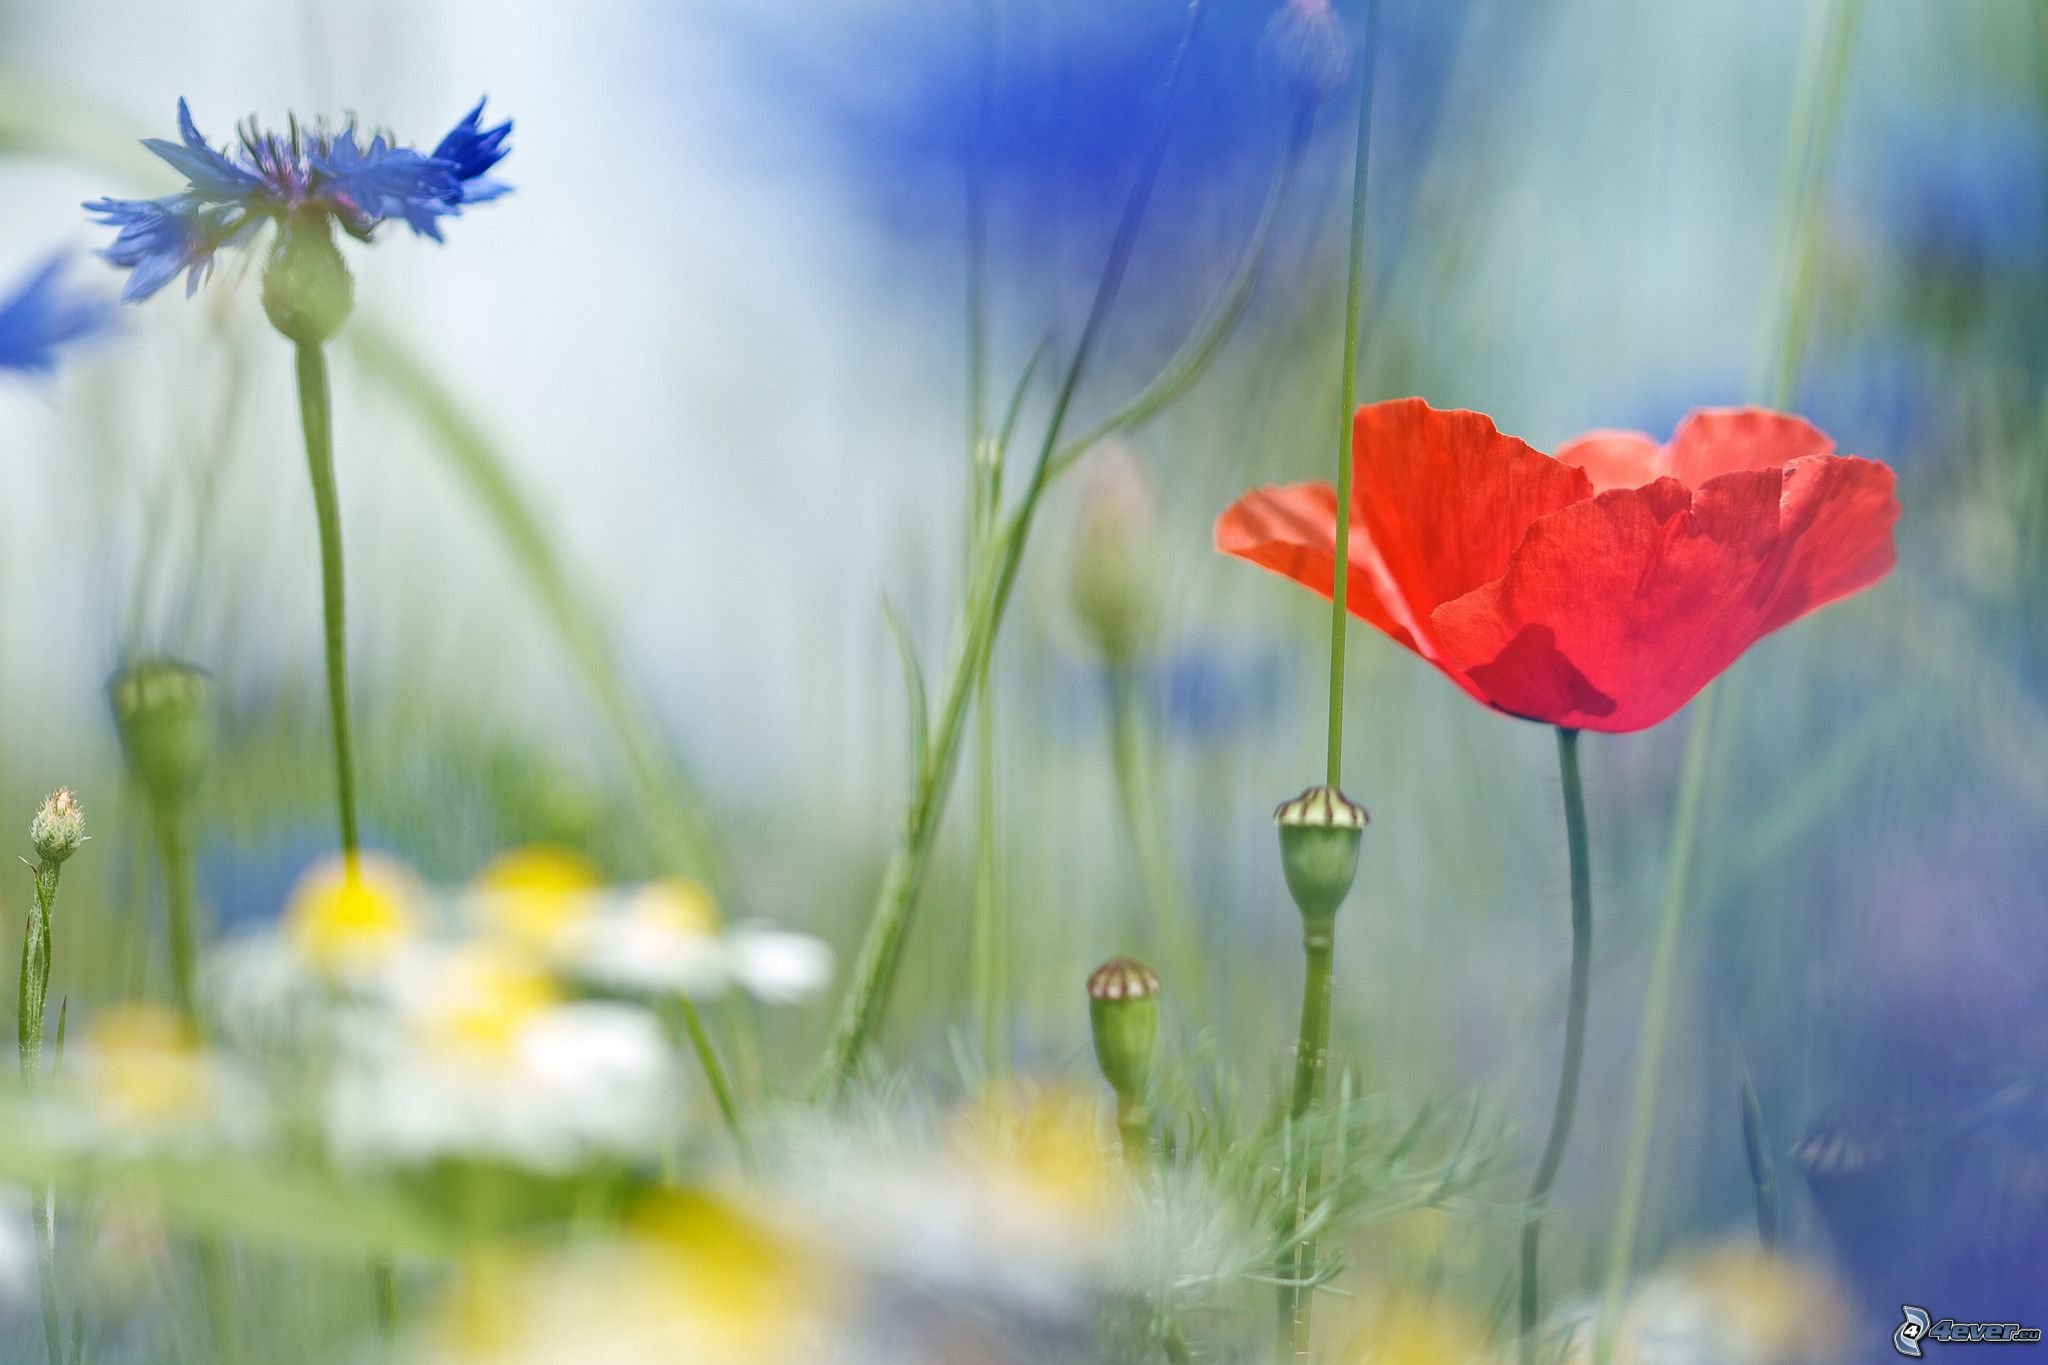 Fiori di campo - Immagini di fiori tedeschi ...